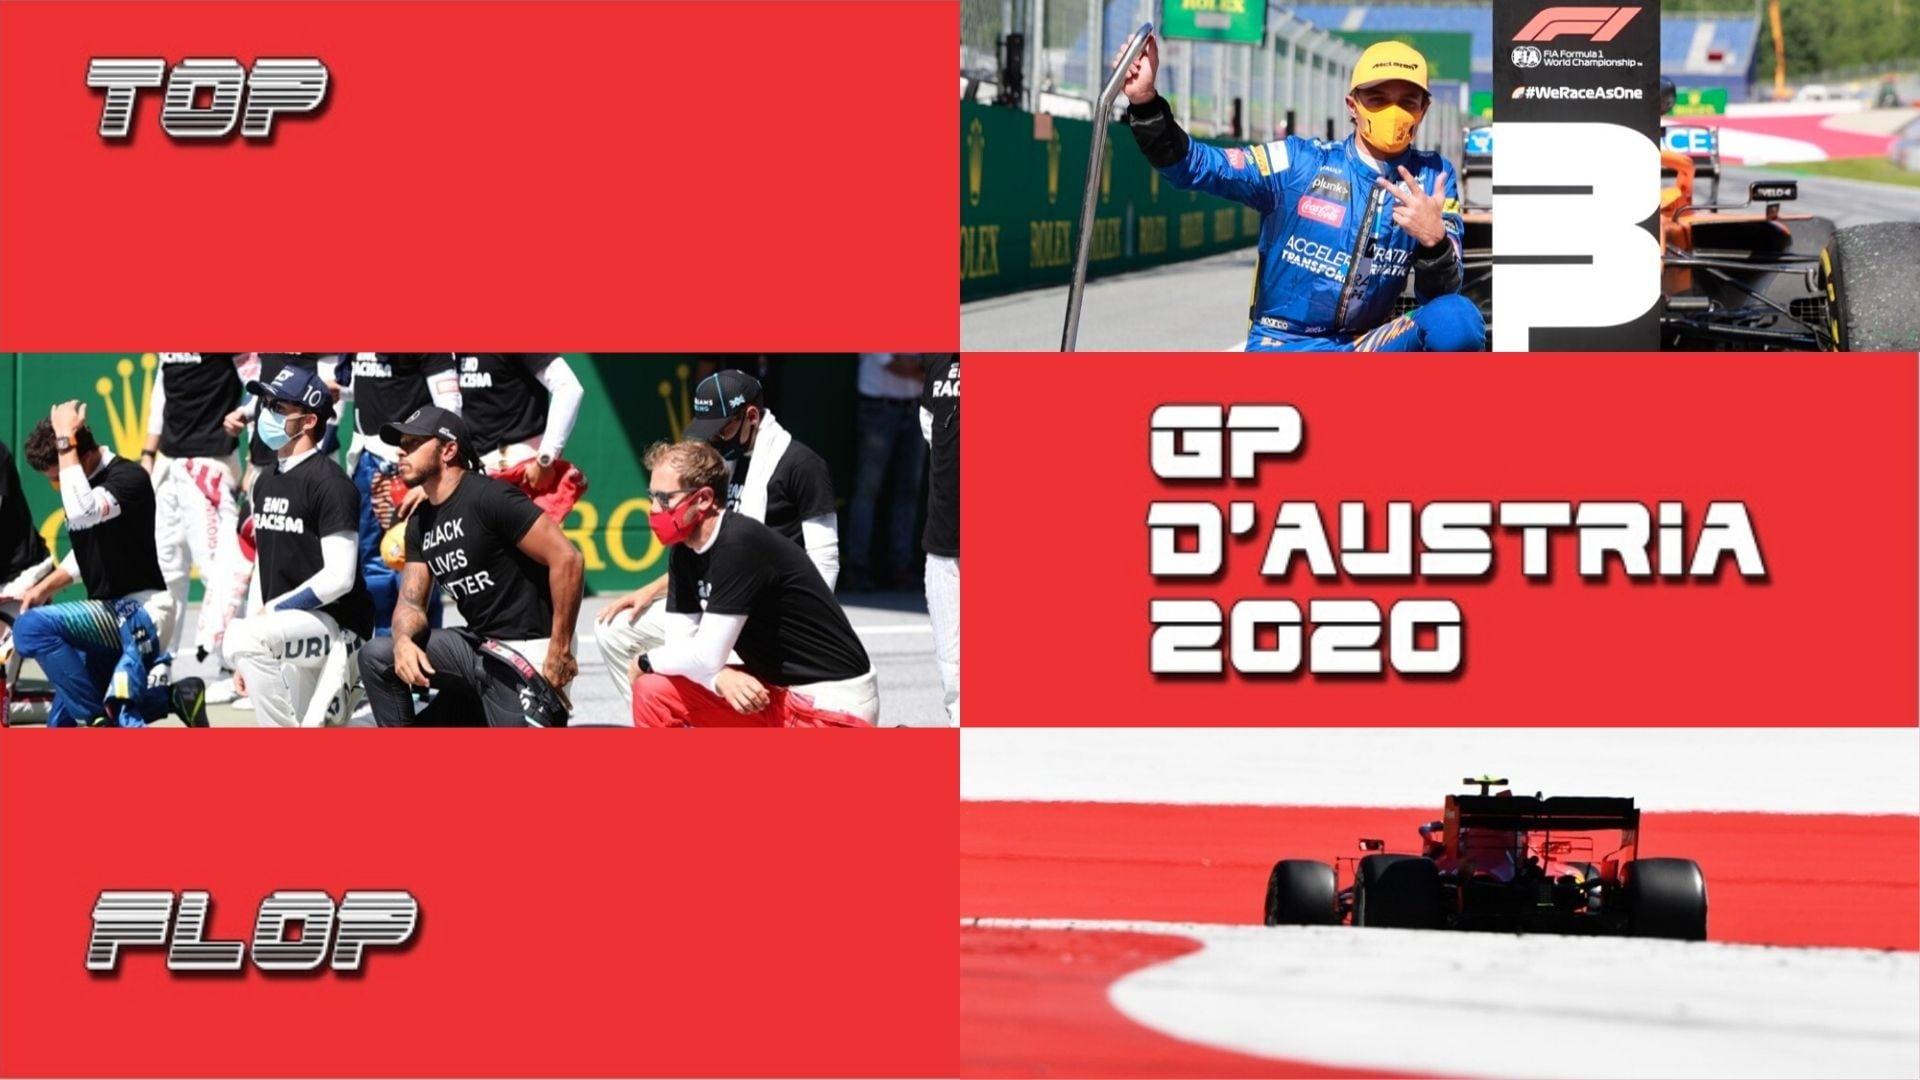 F1, Gp Austria: la classifica Top e Flop